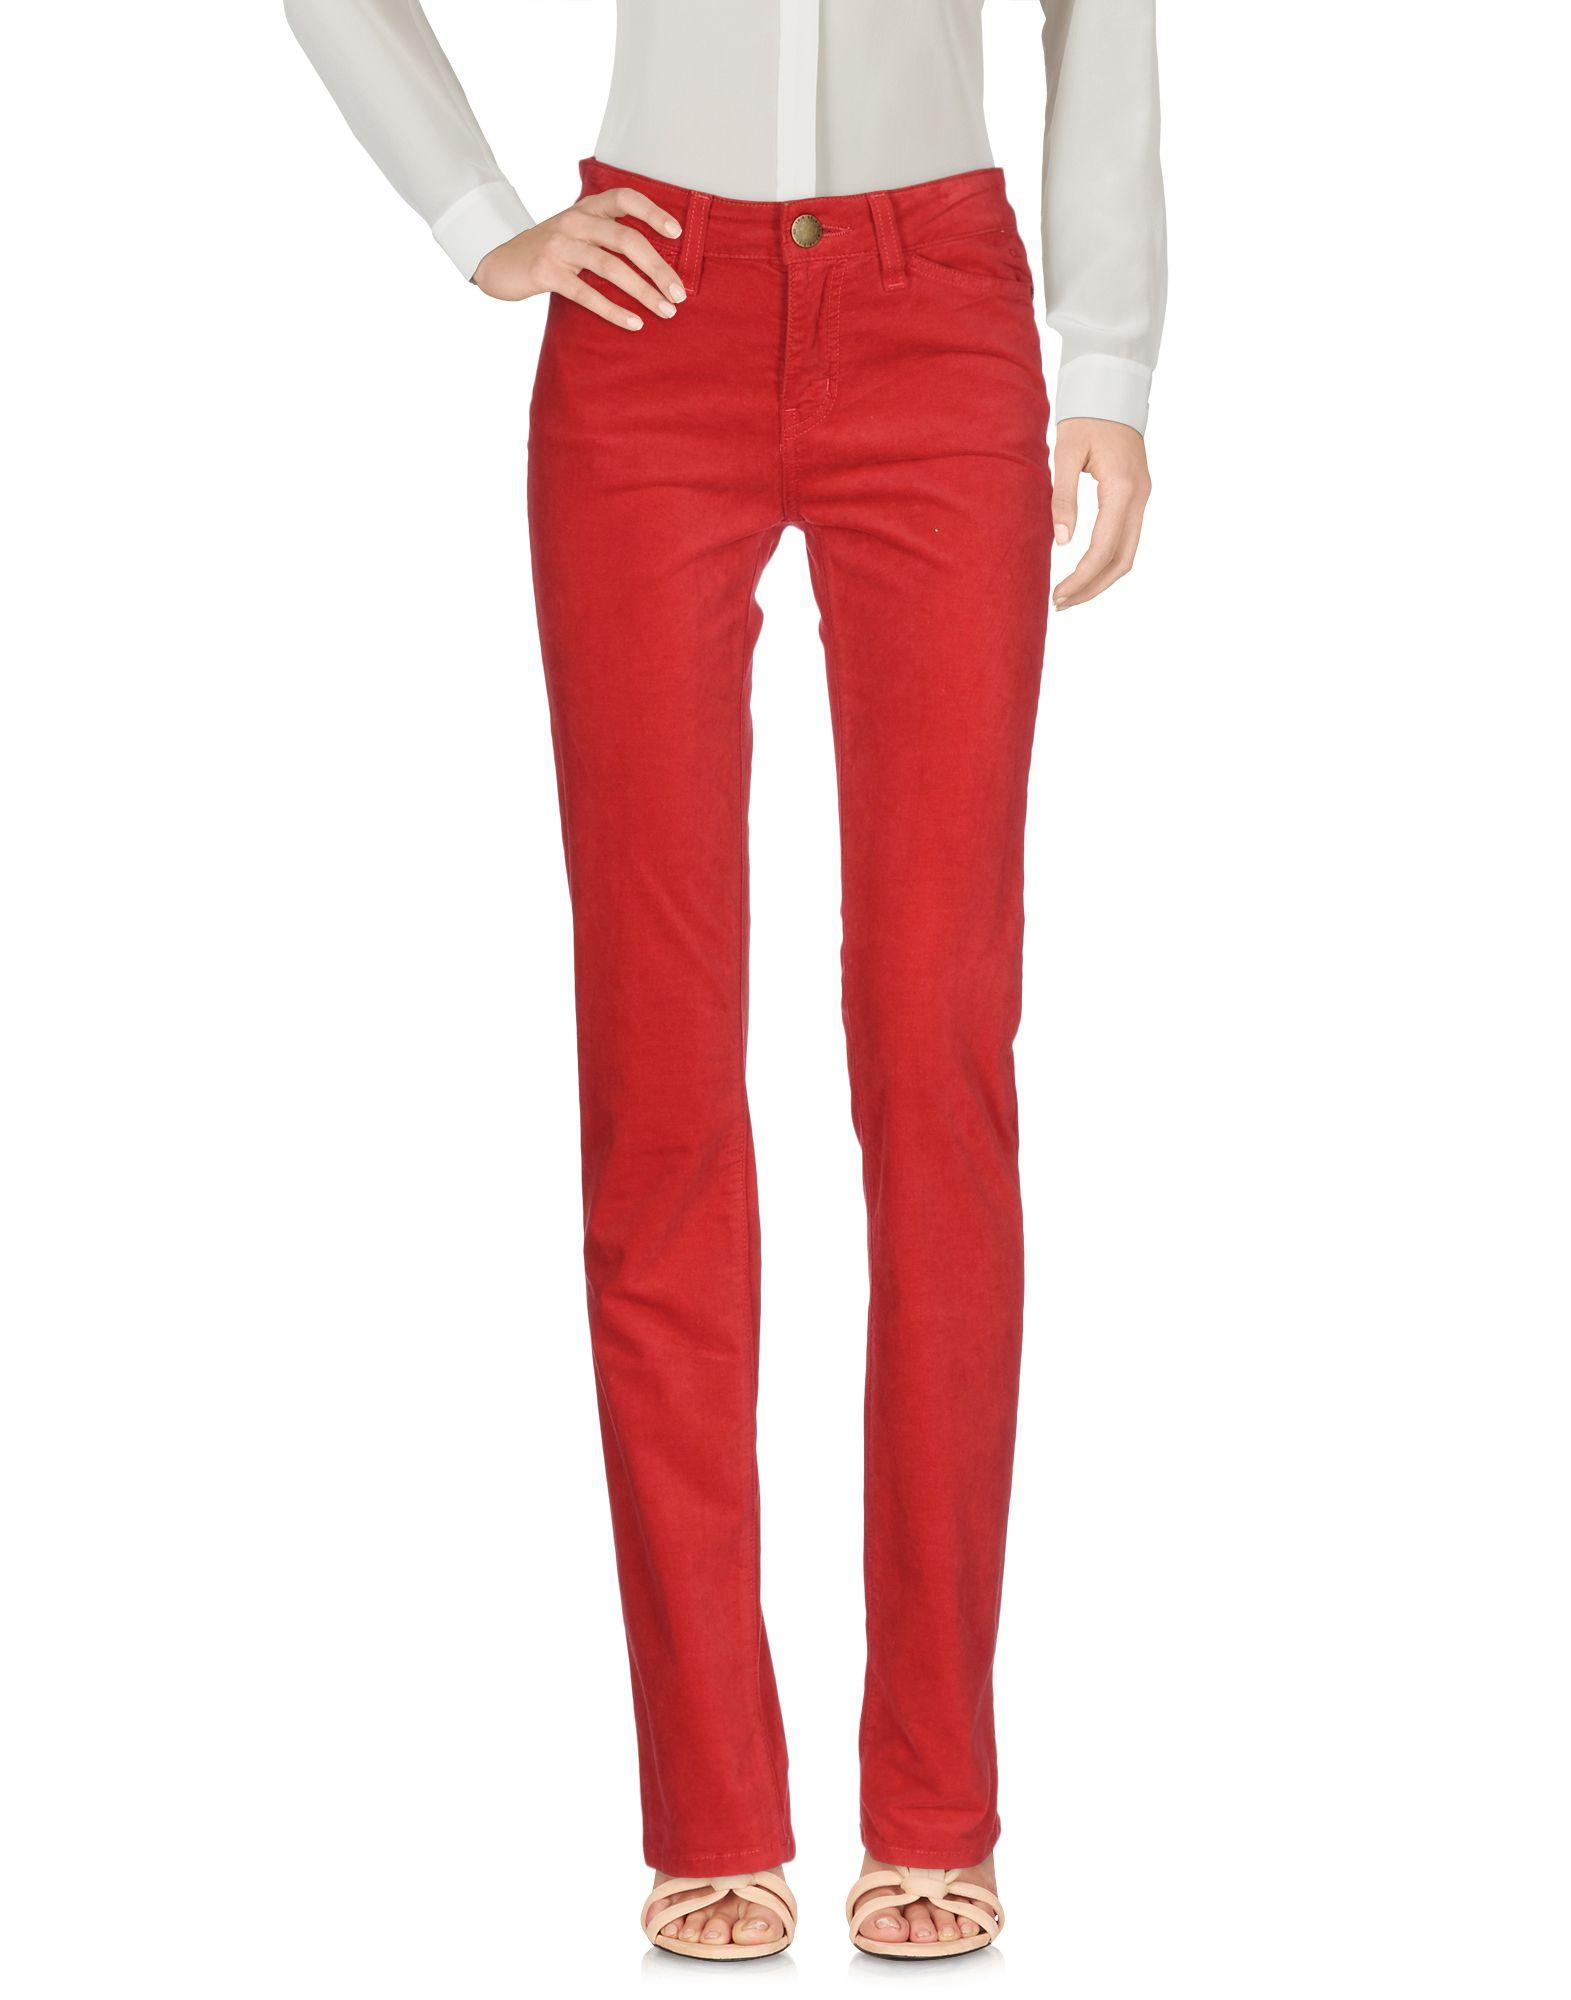 CURRENT/ELLIOT + CHARLOTTE GAINSBOURG Повседневные брюки